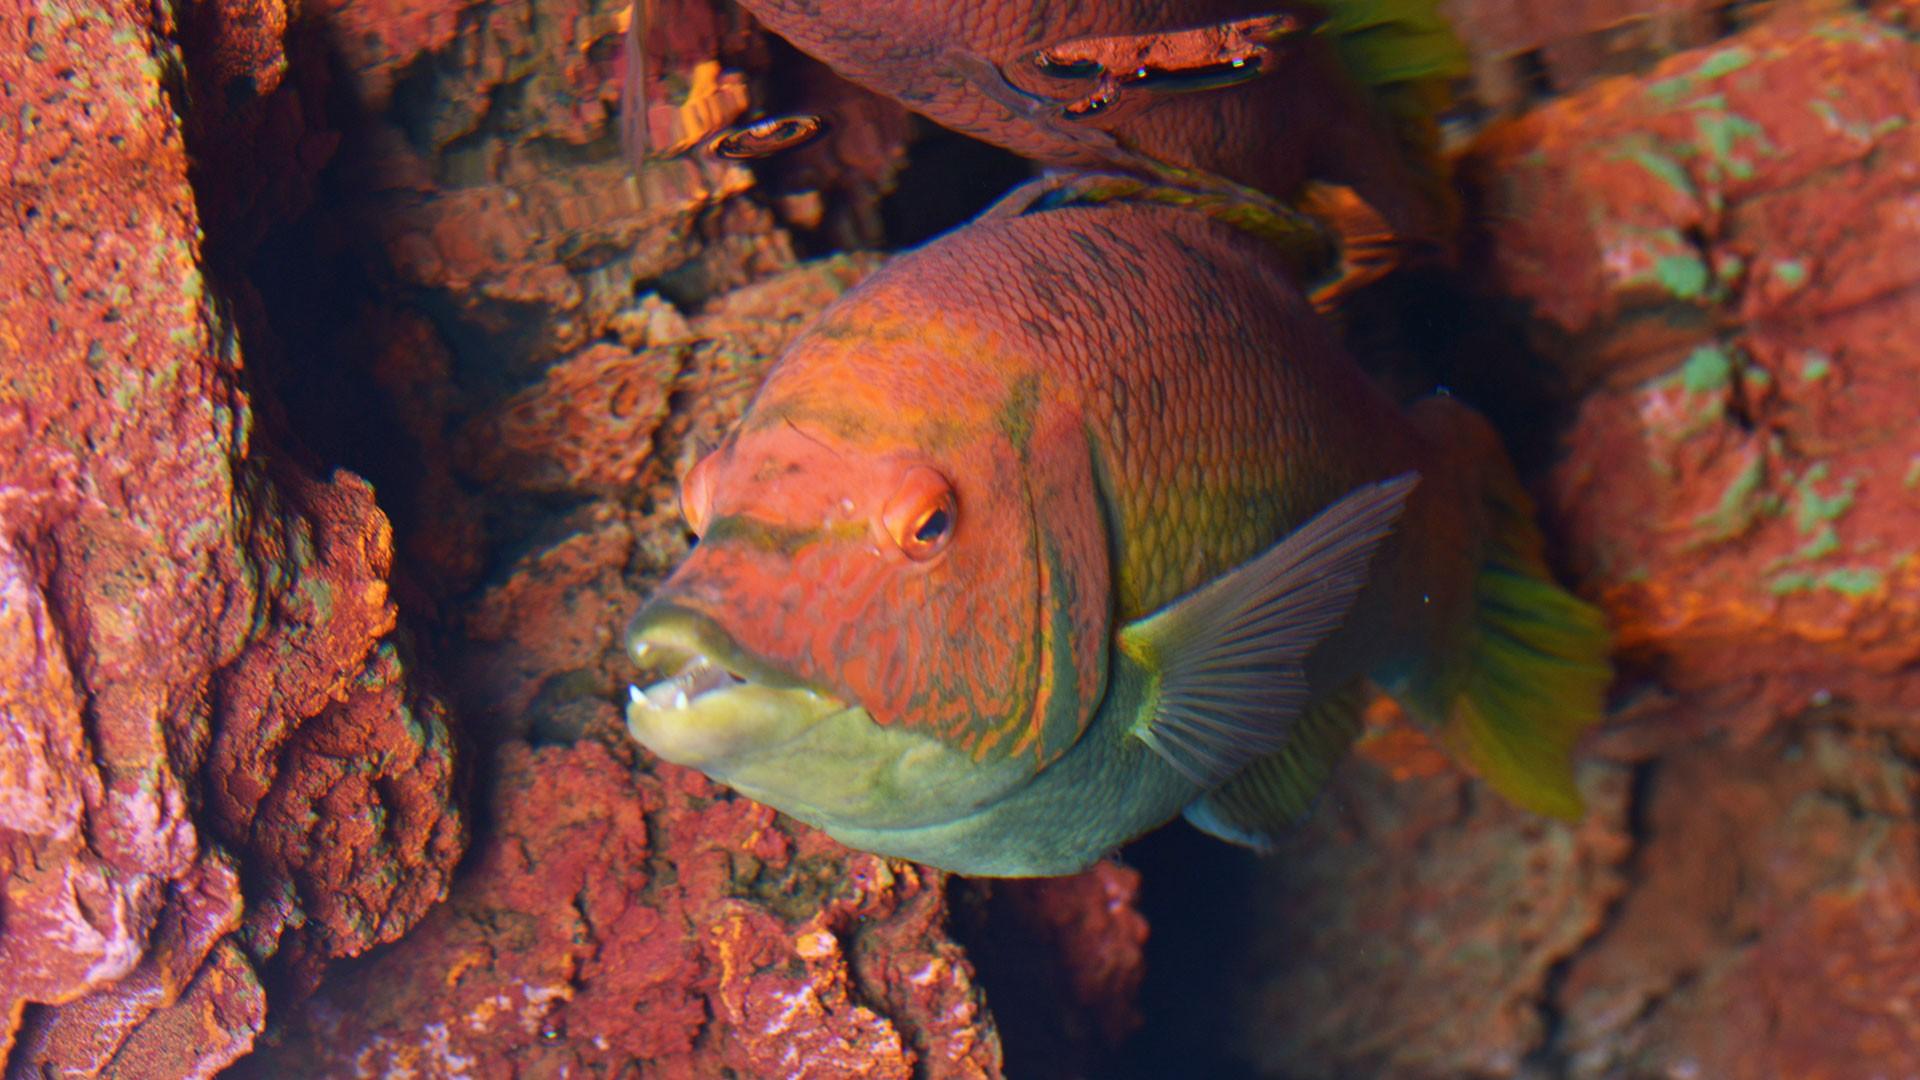 Barred hogfish